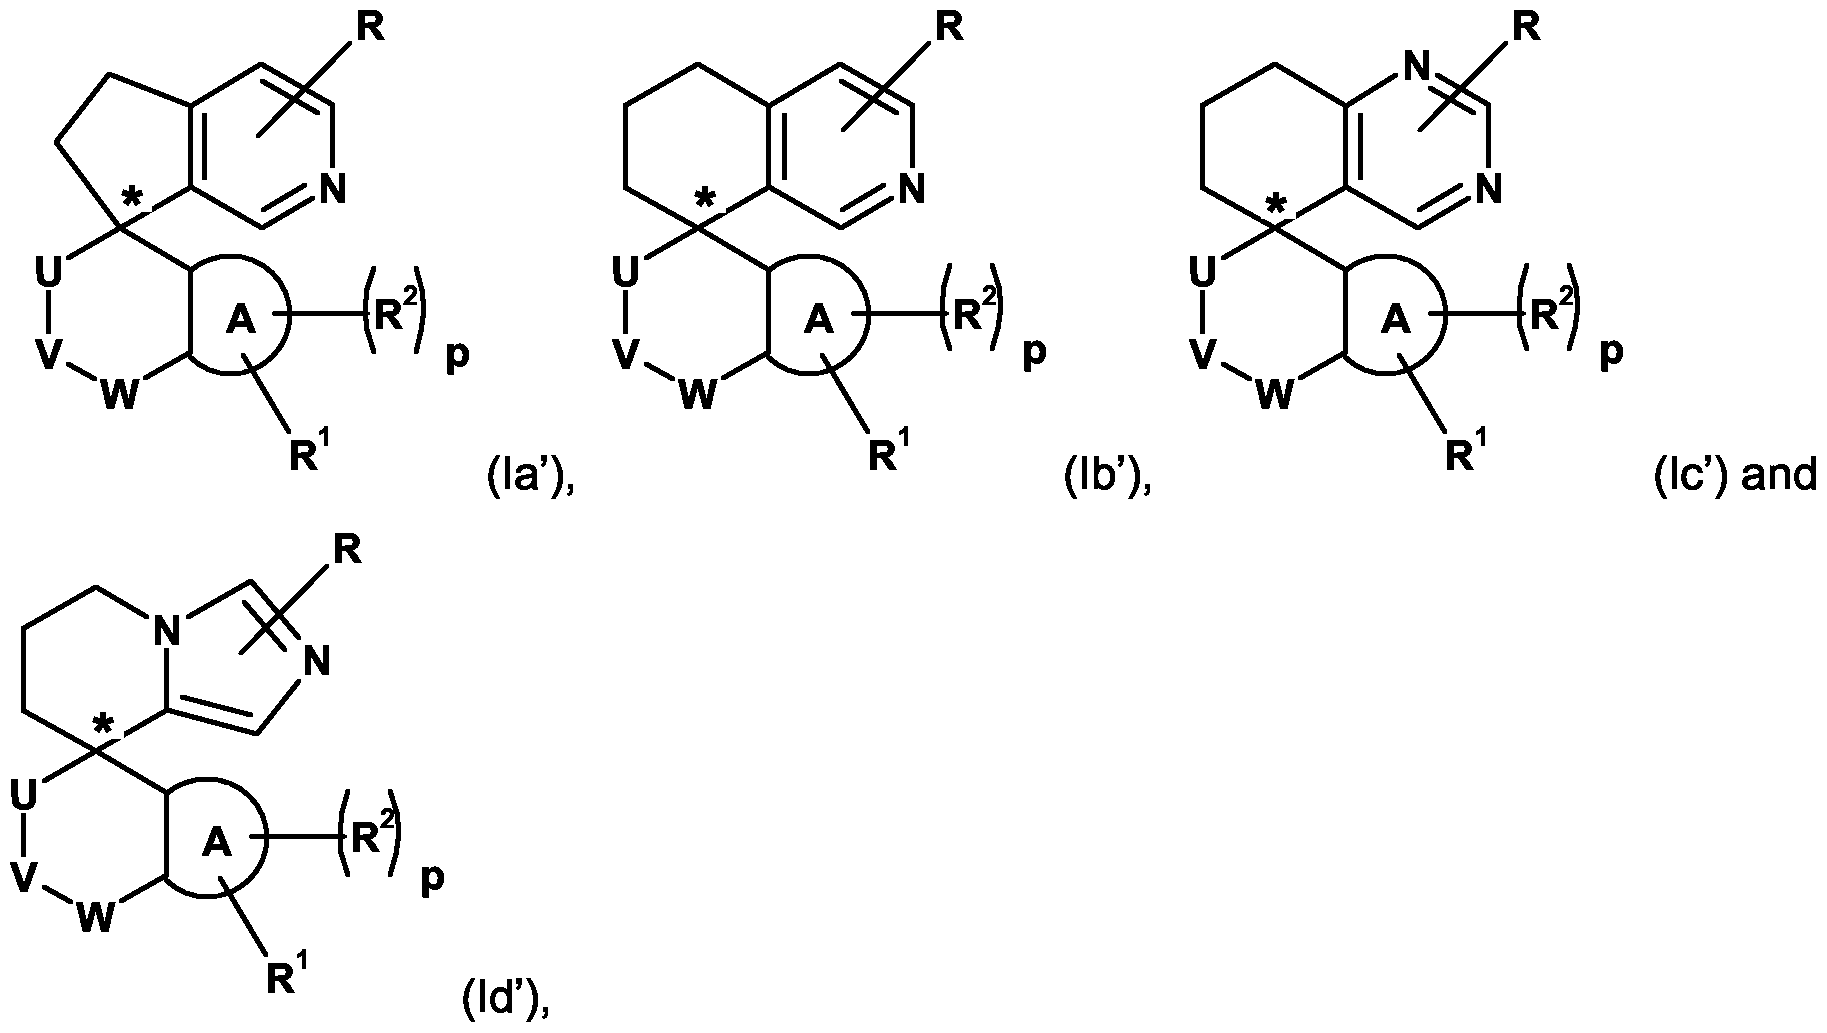 acyclovir zovirax or generic for free